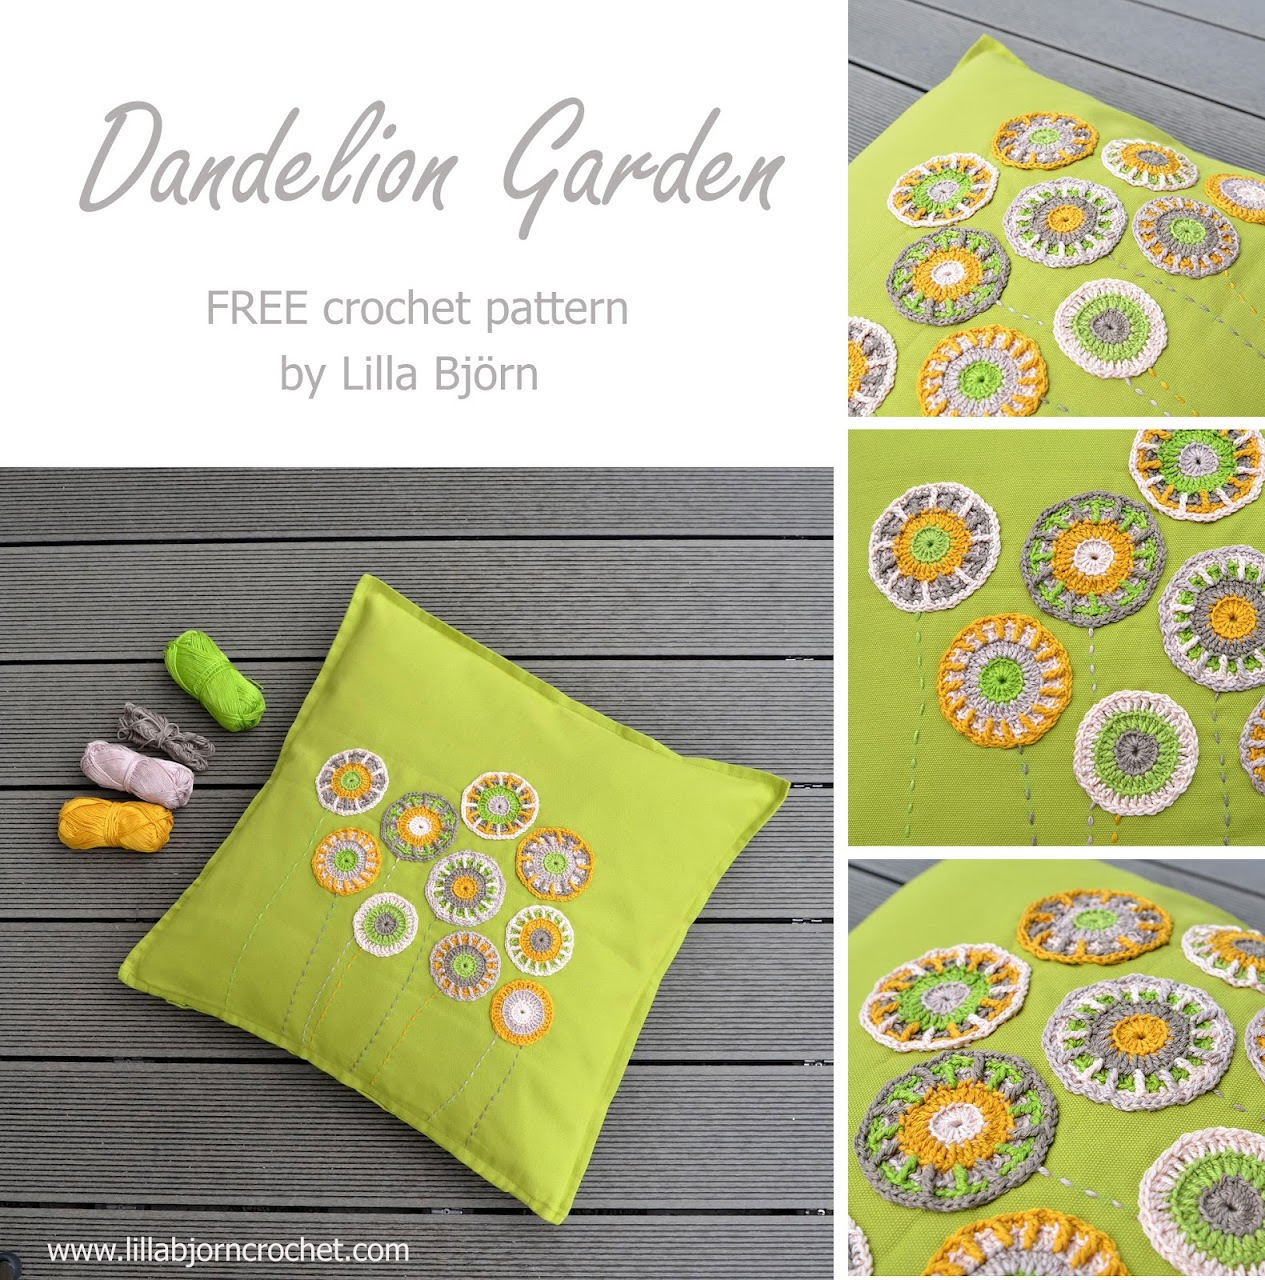 Dandelion Garden pillow - free overlay crochet pattern by Lilla Bjorn